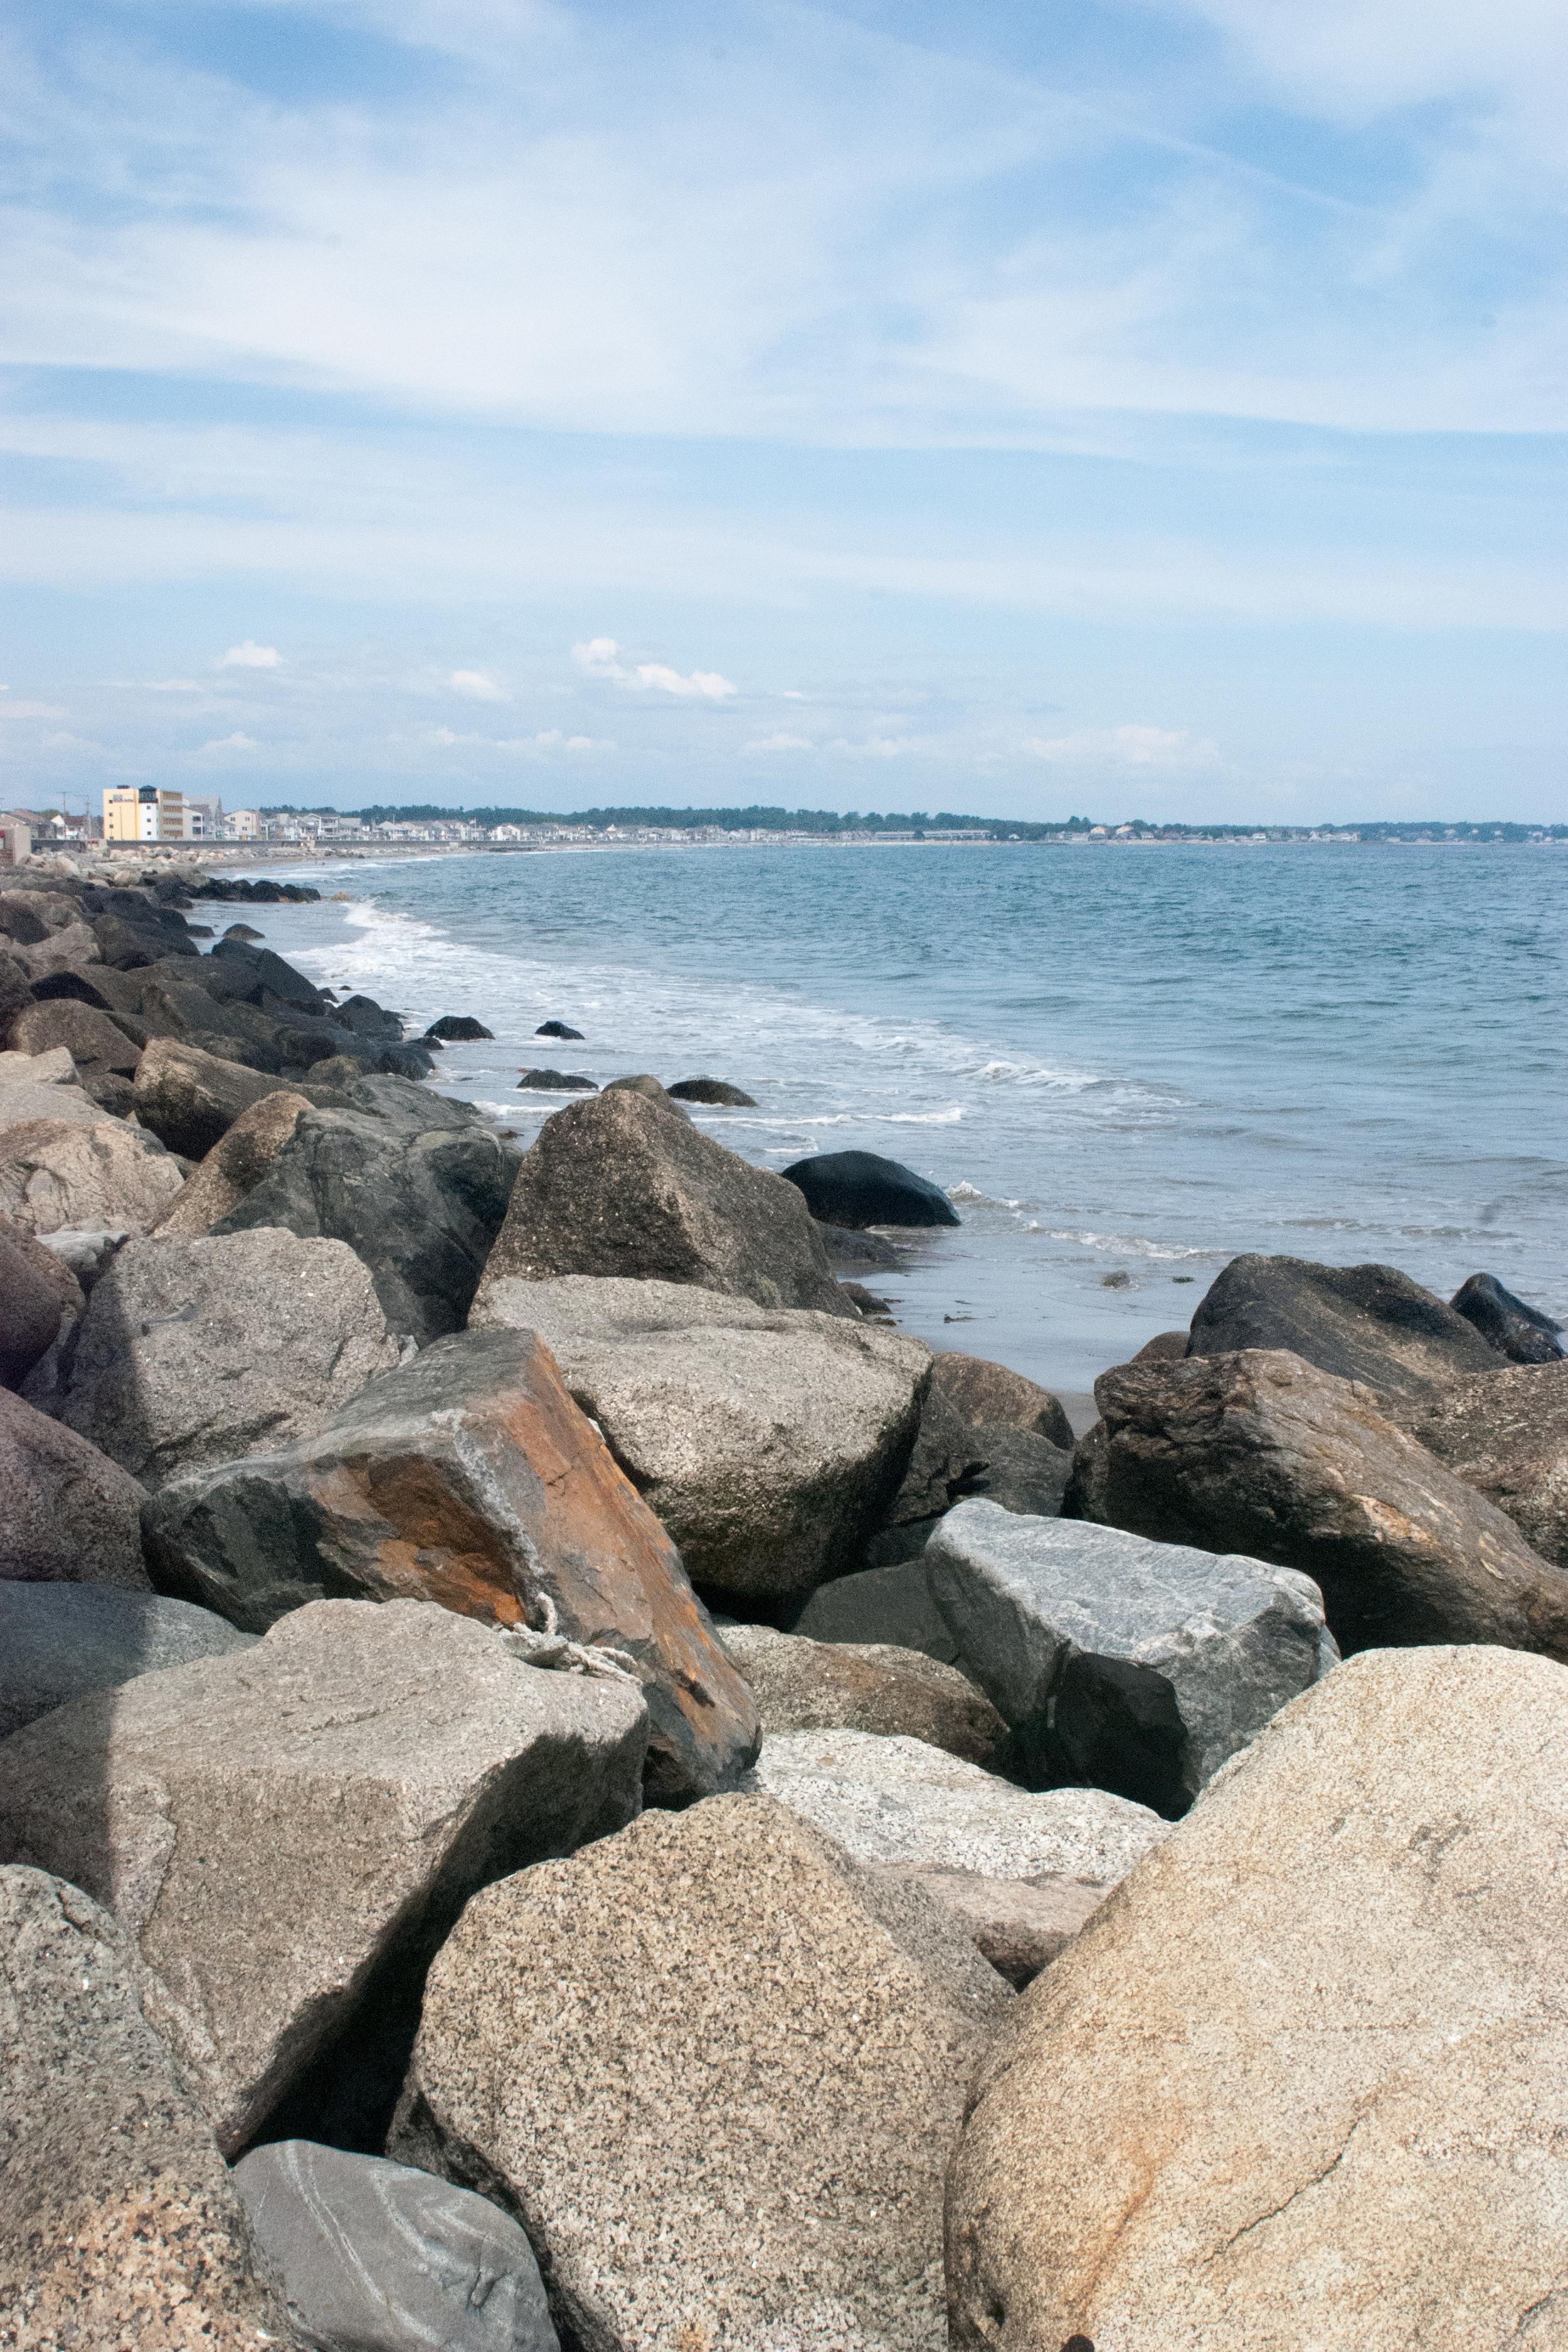 12: The Rocks